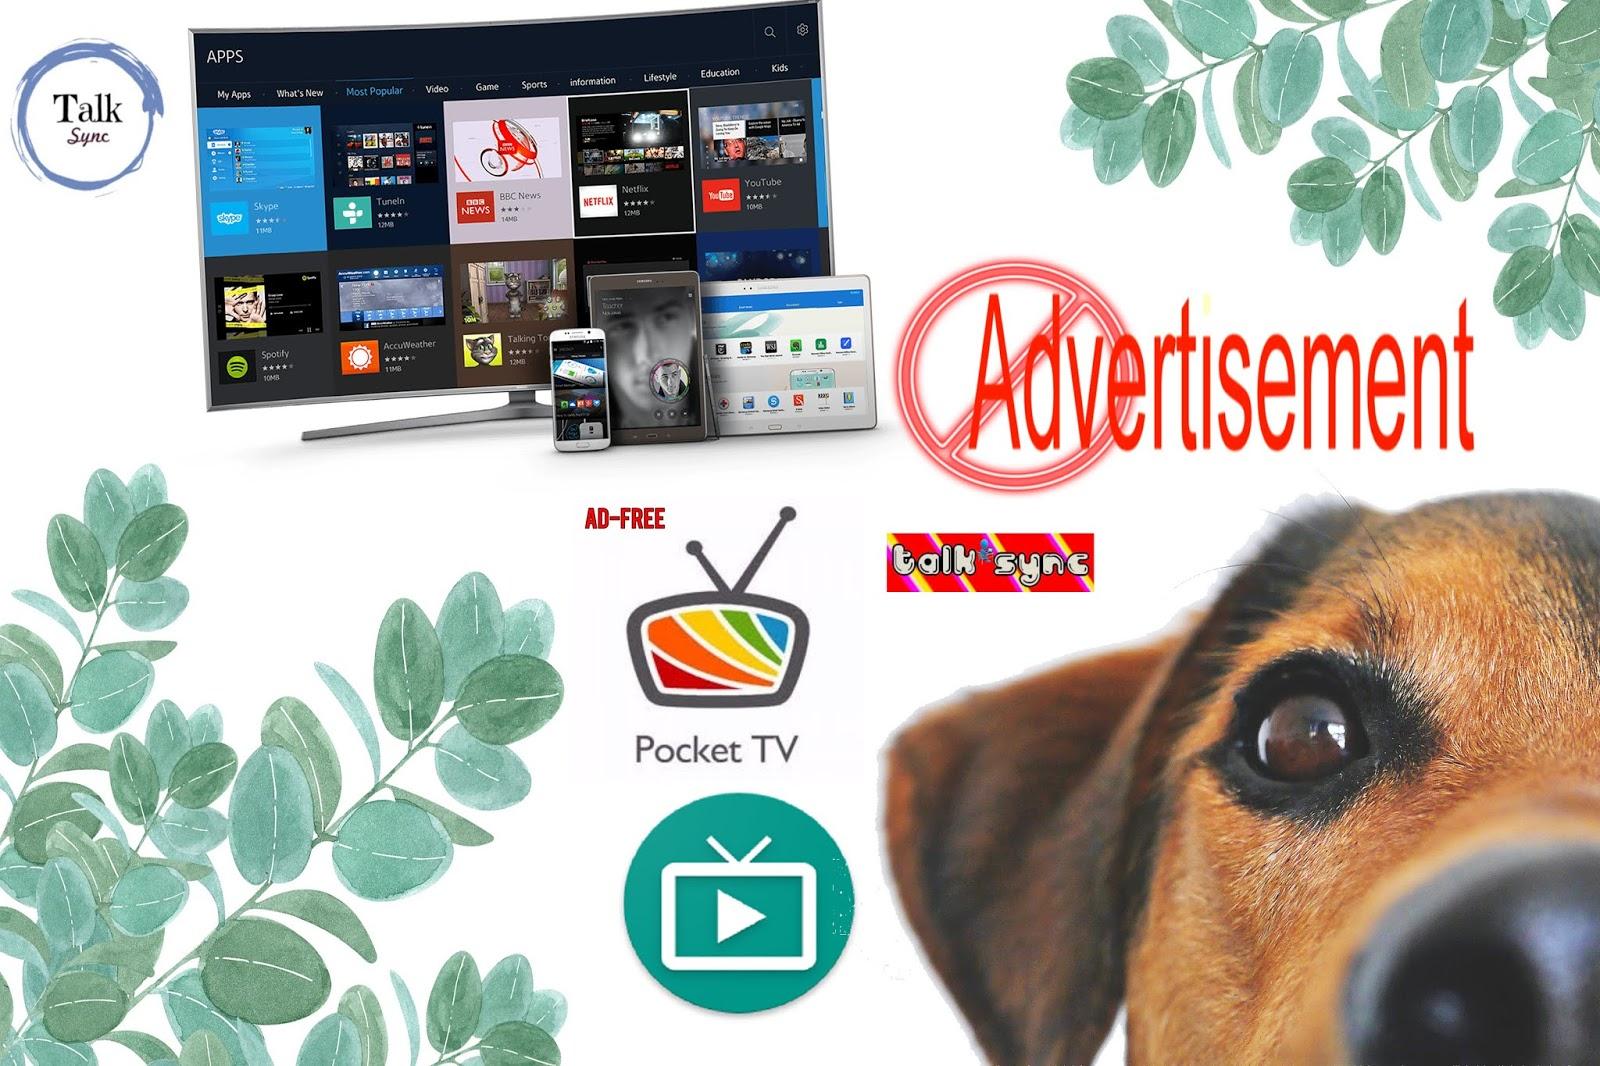 AD FREE LIVE TV APP - Talk Sync